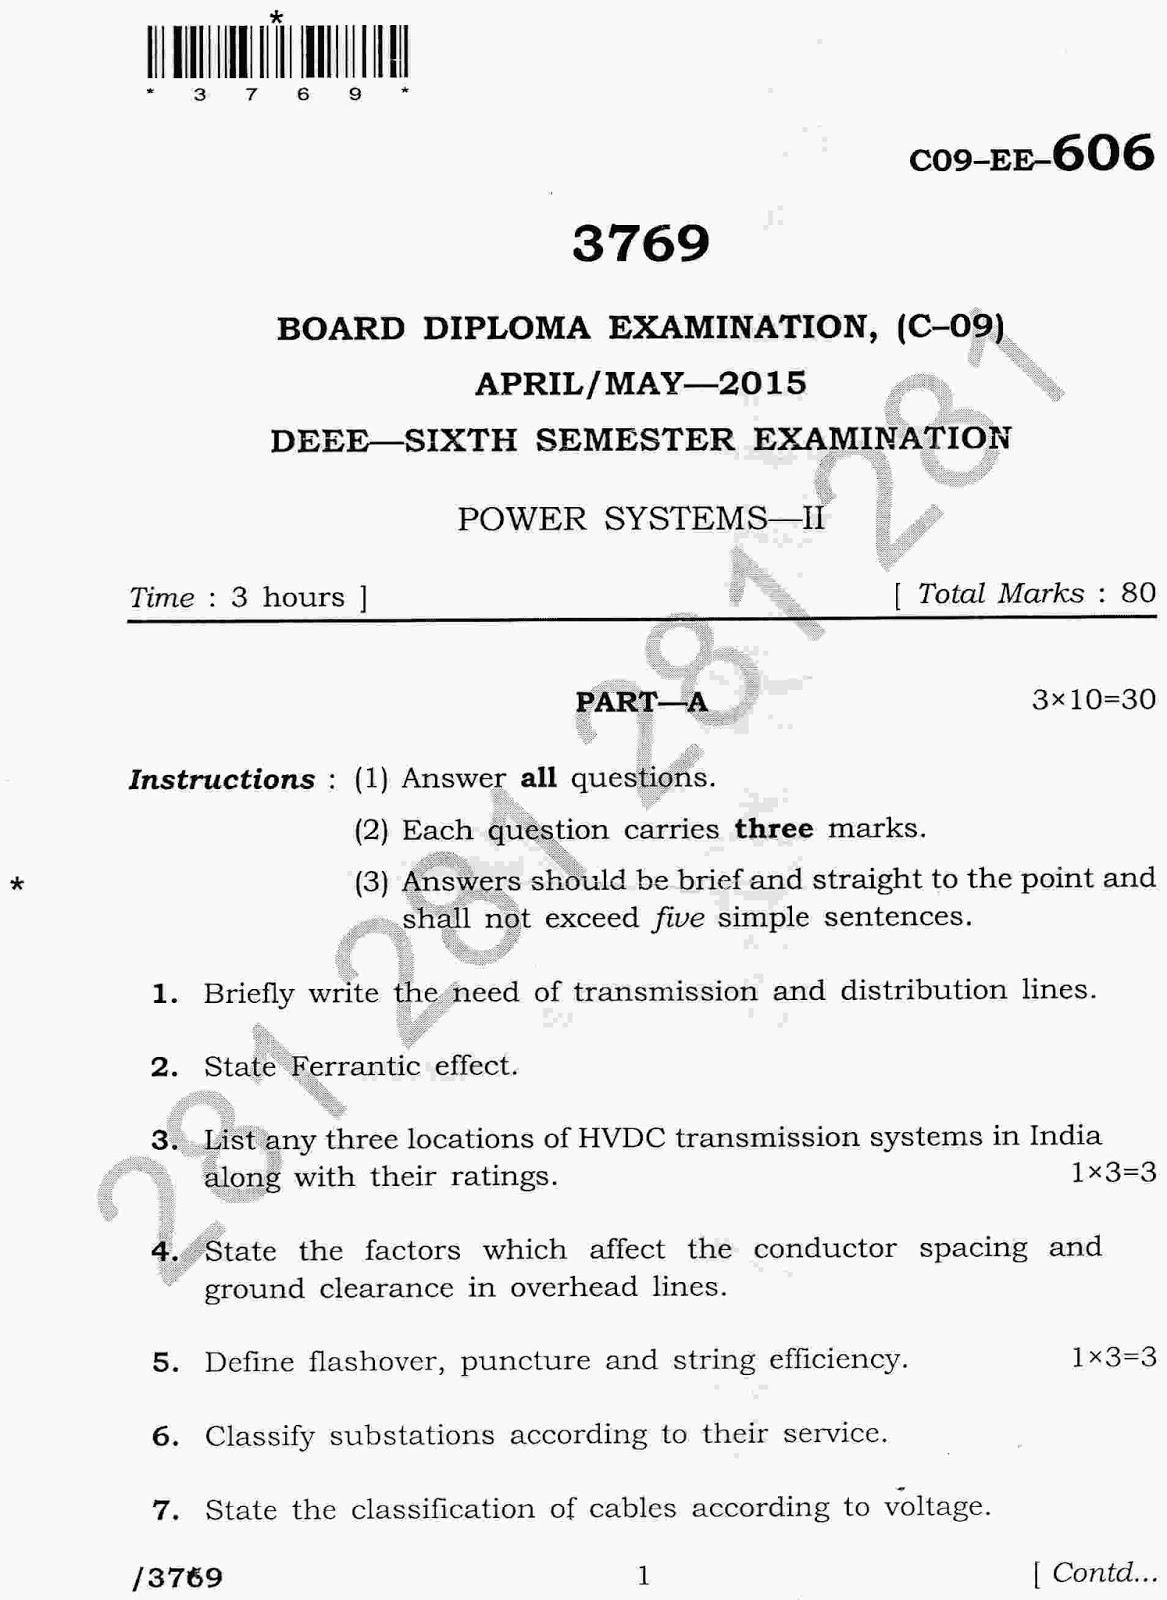 Ap diploma results c14 dating 3